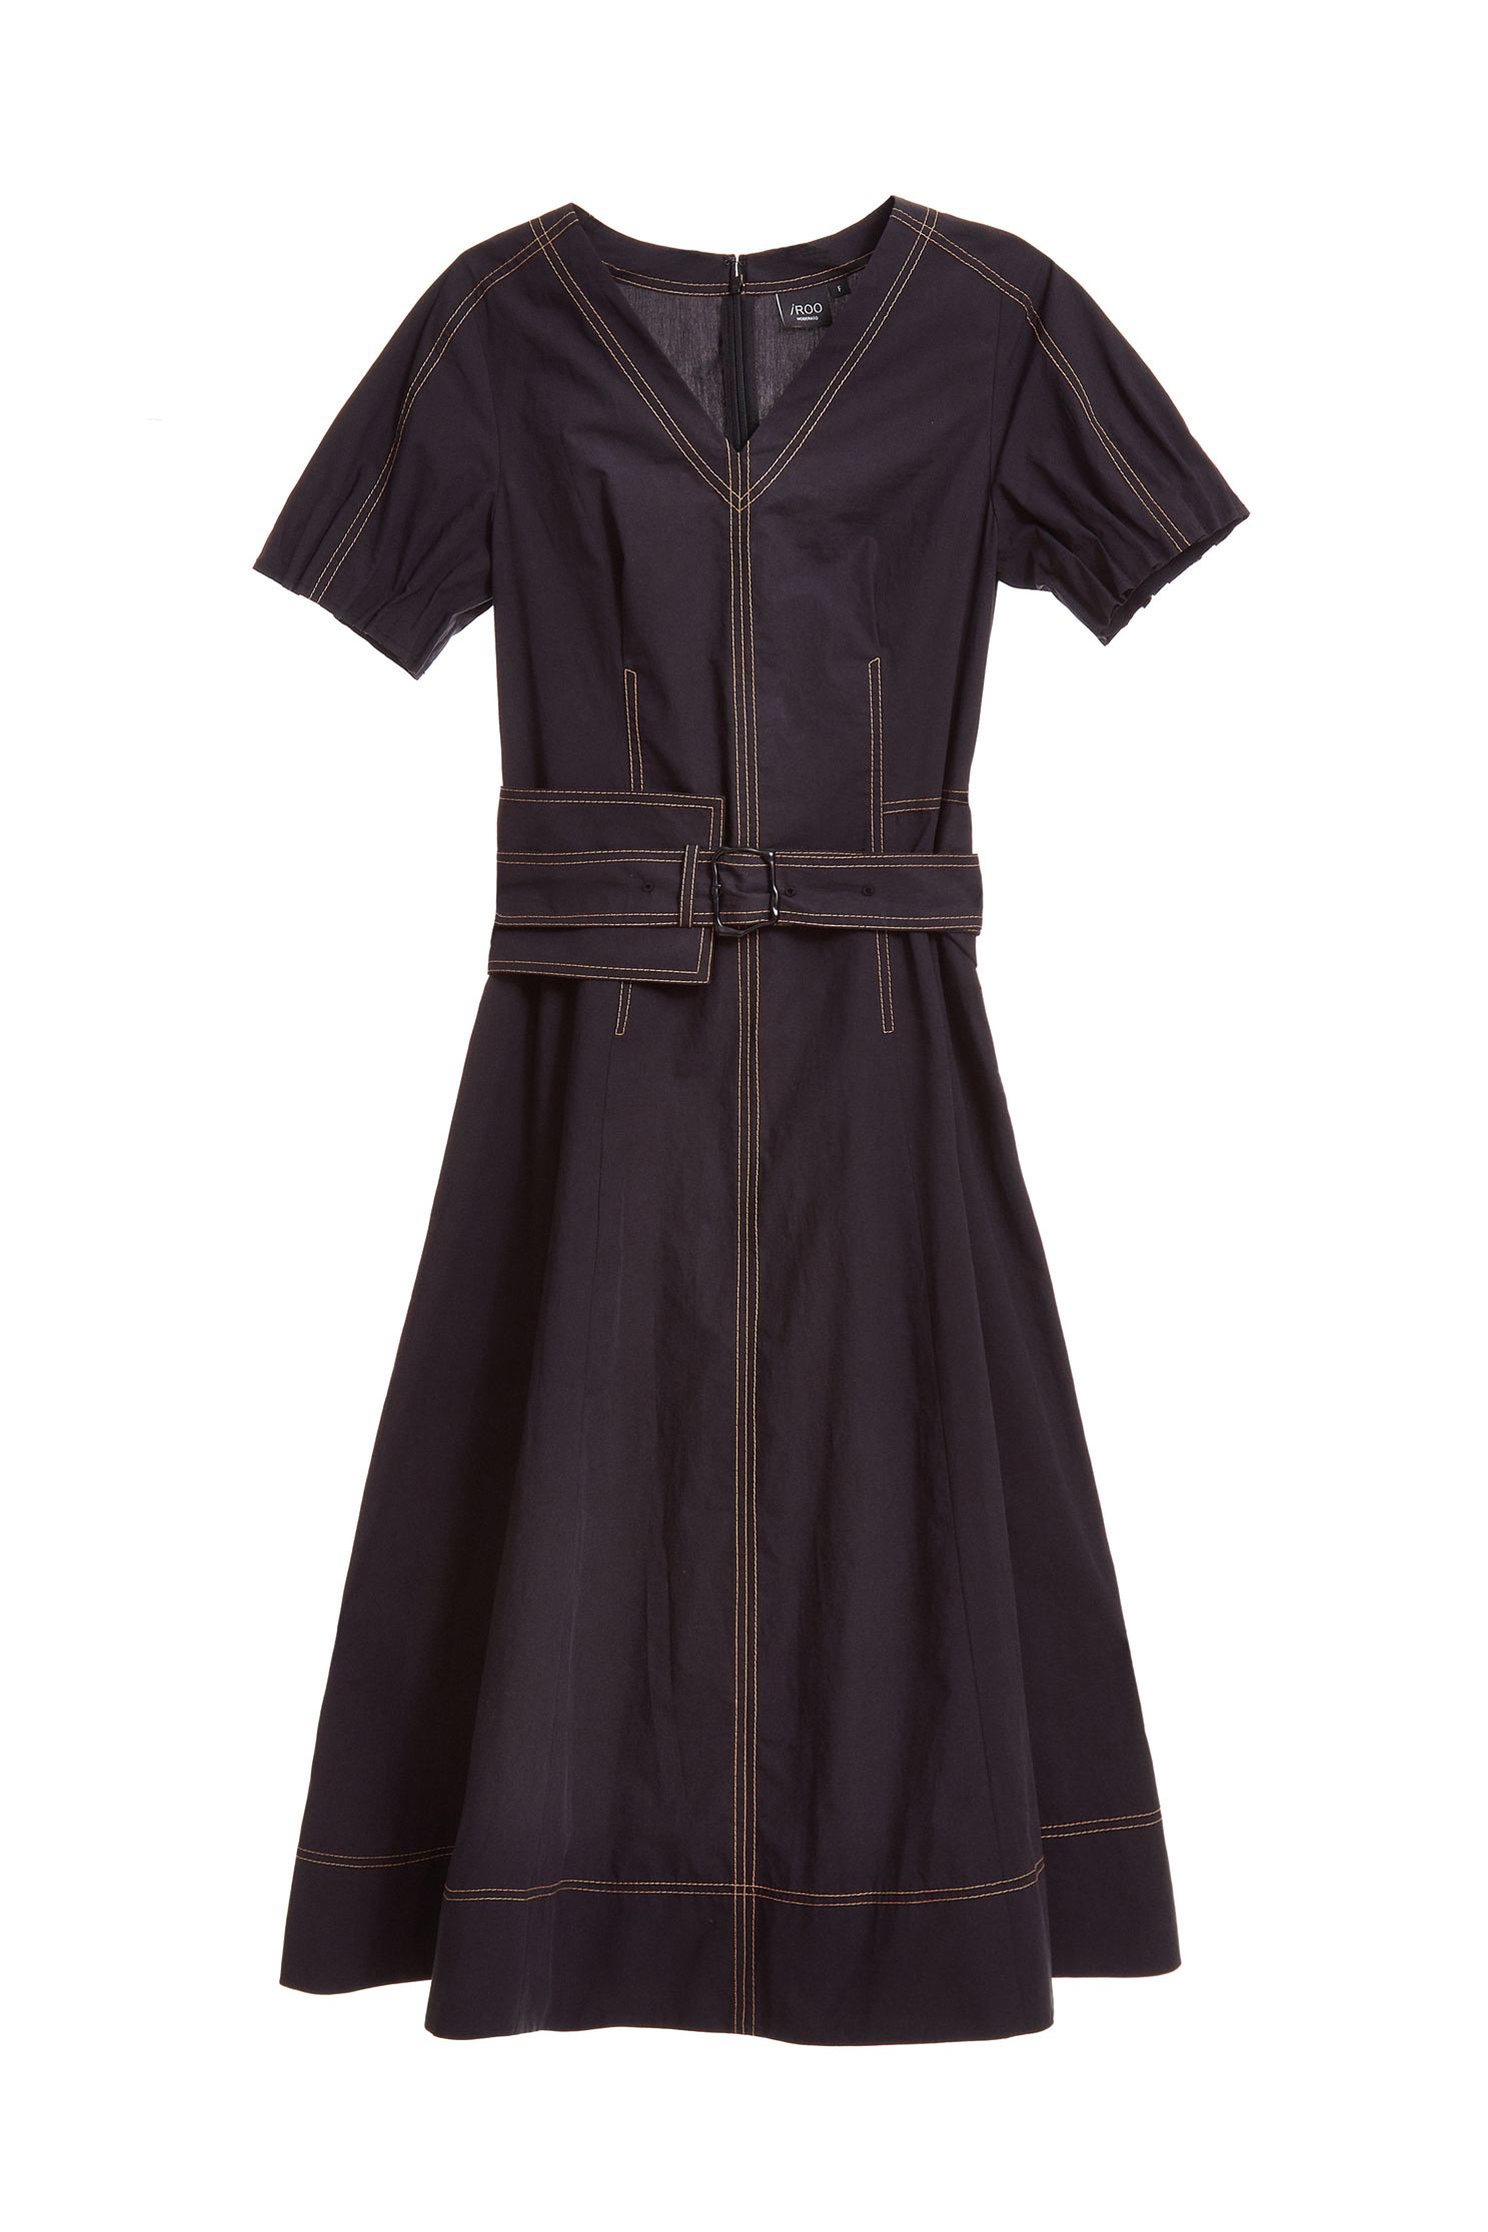 V-neck strap classic dress